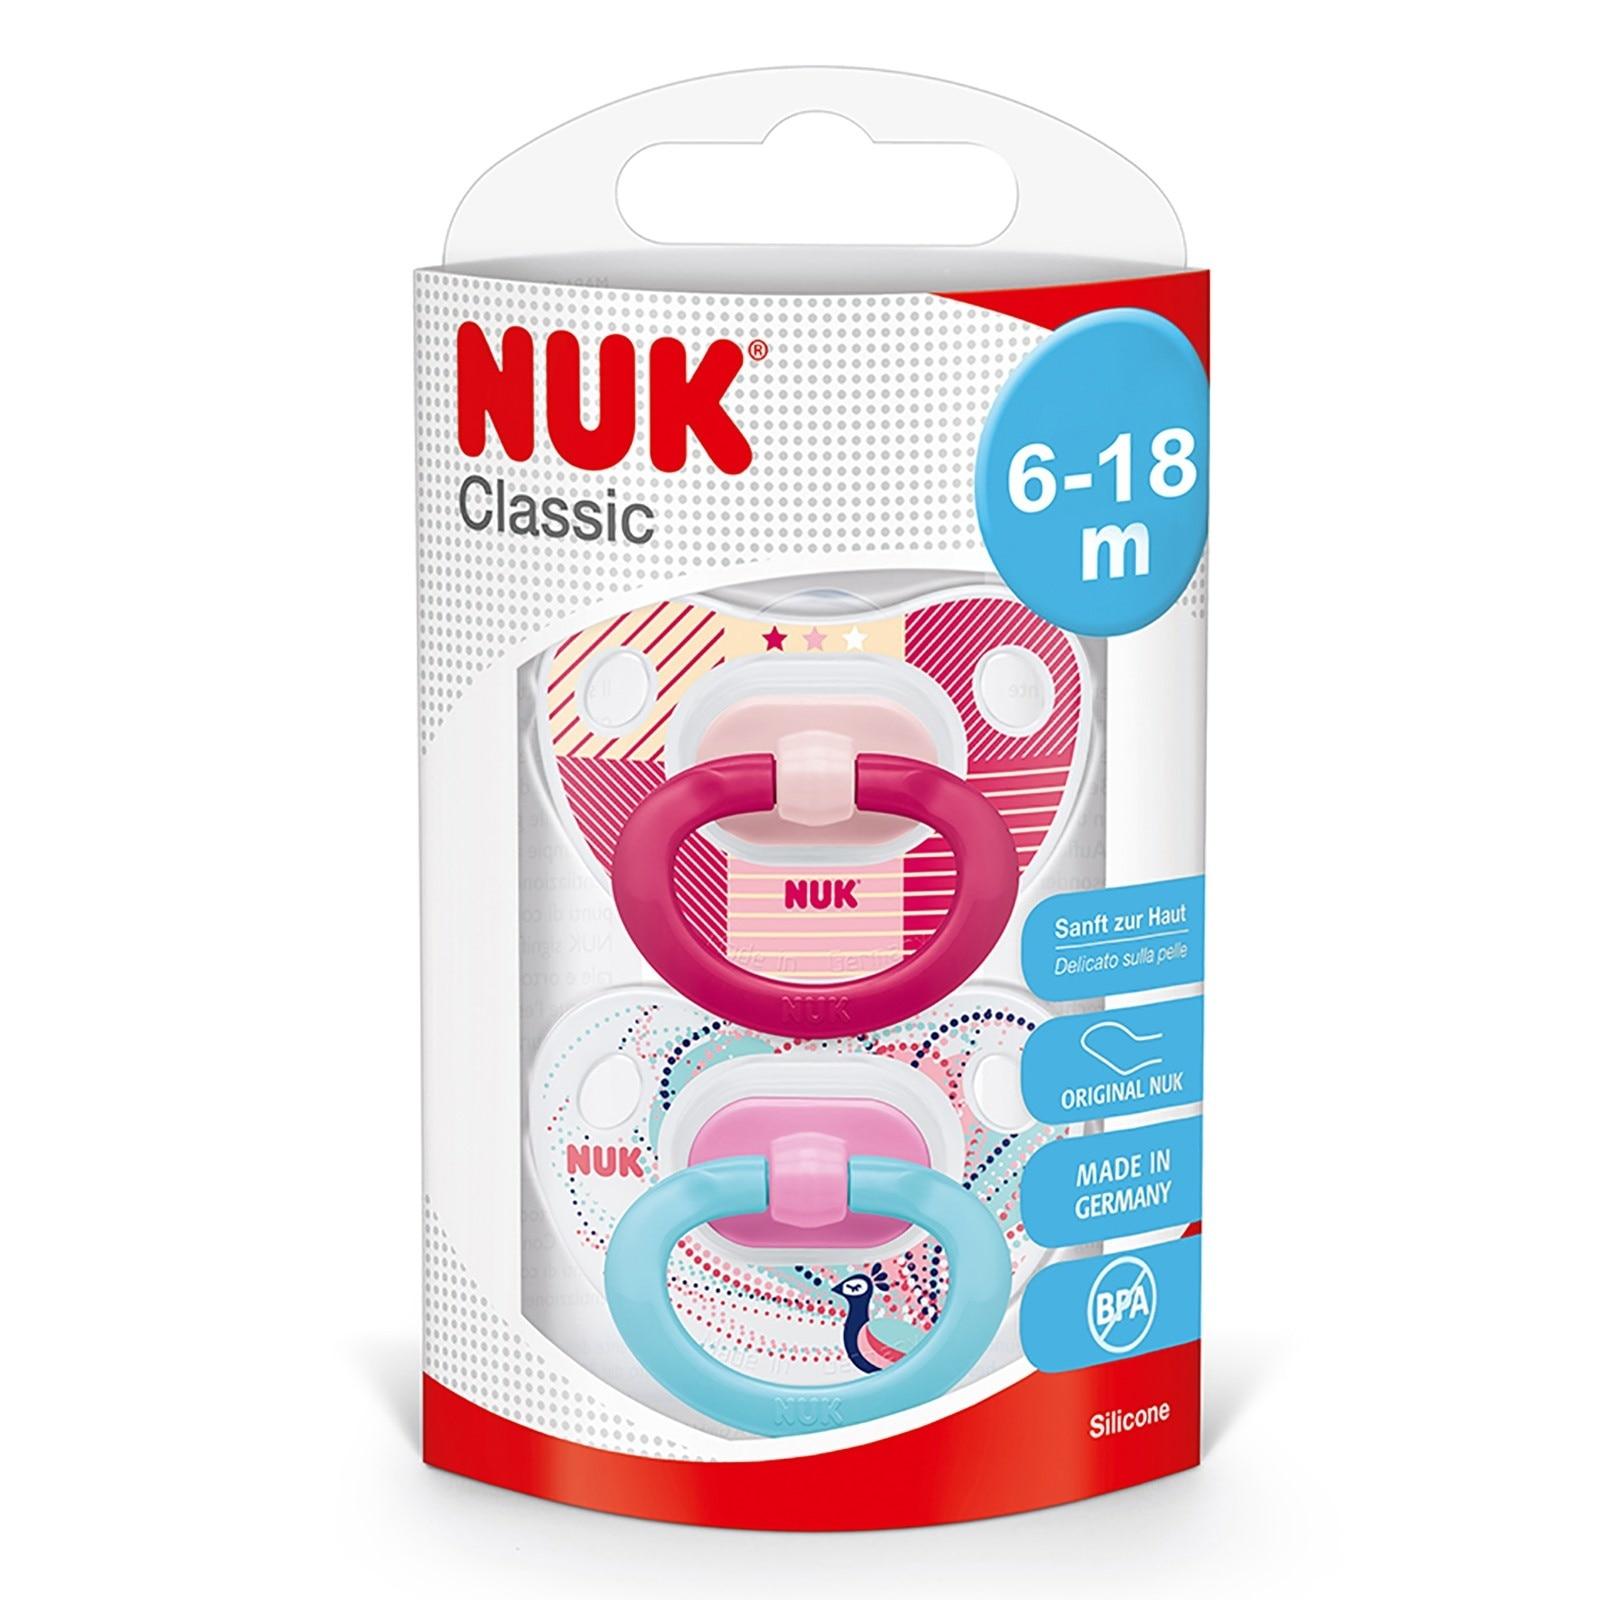 Ebebek Nuk Silicone Classic Baby Pacifier 6-18 Months 2 Pcs